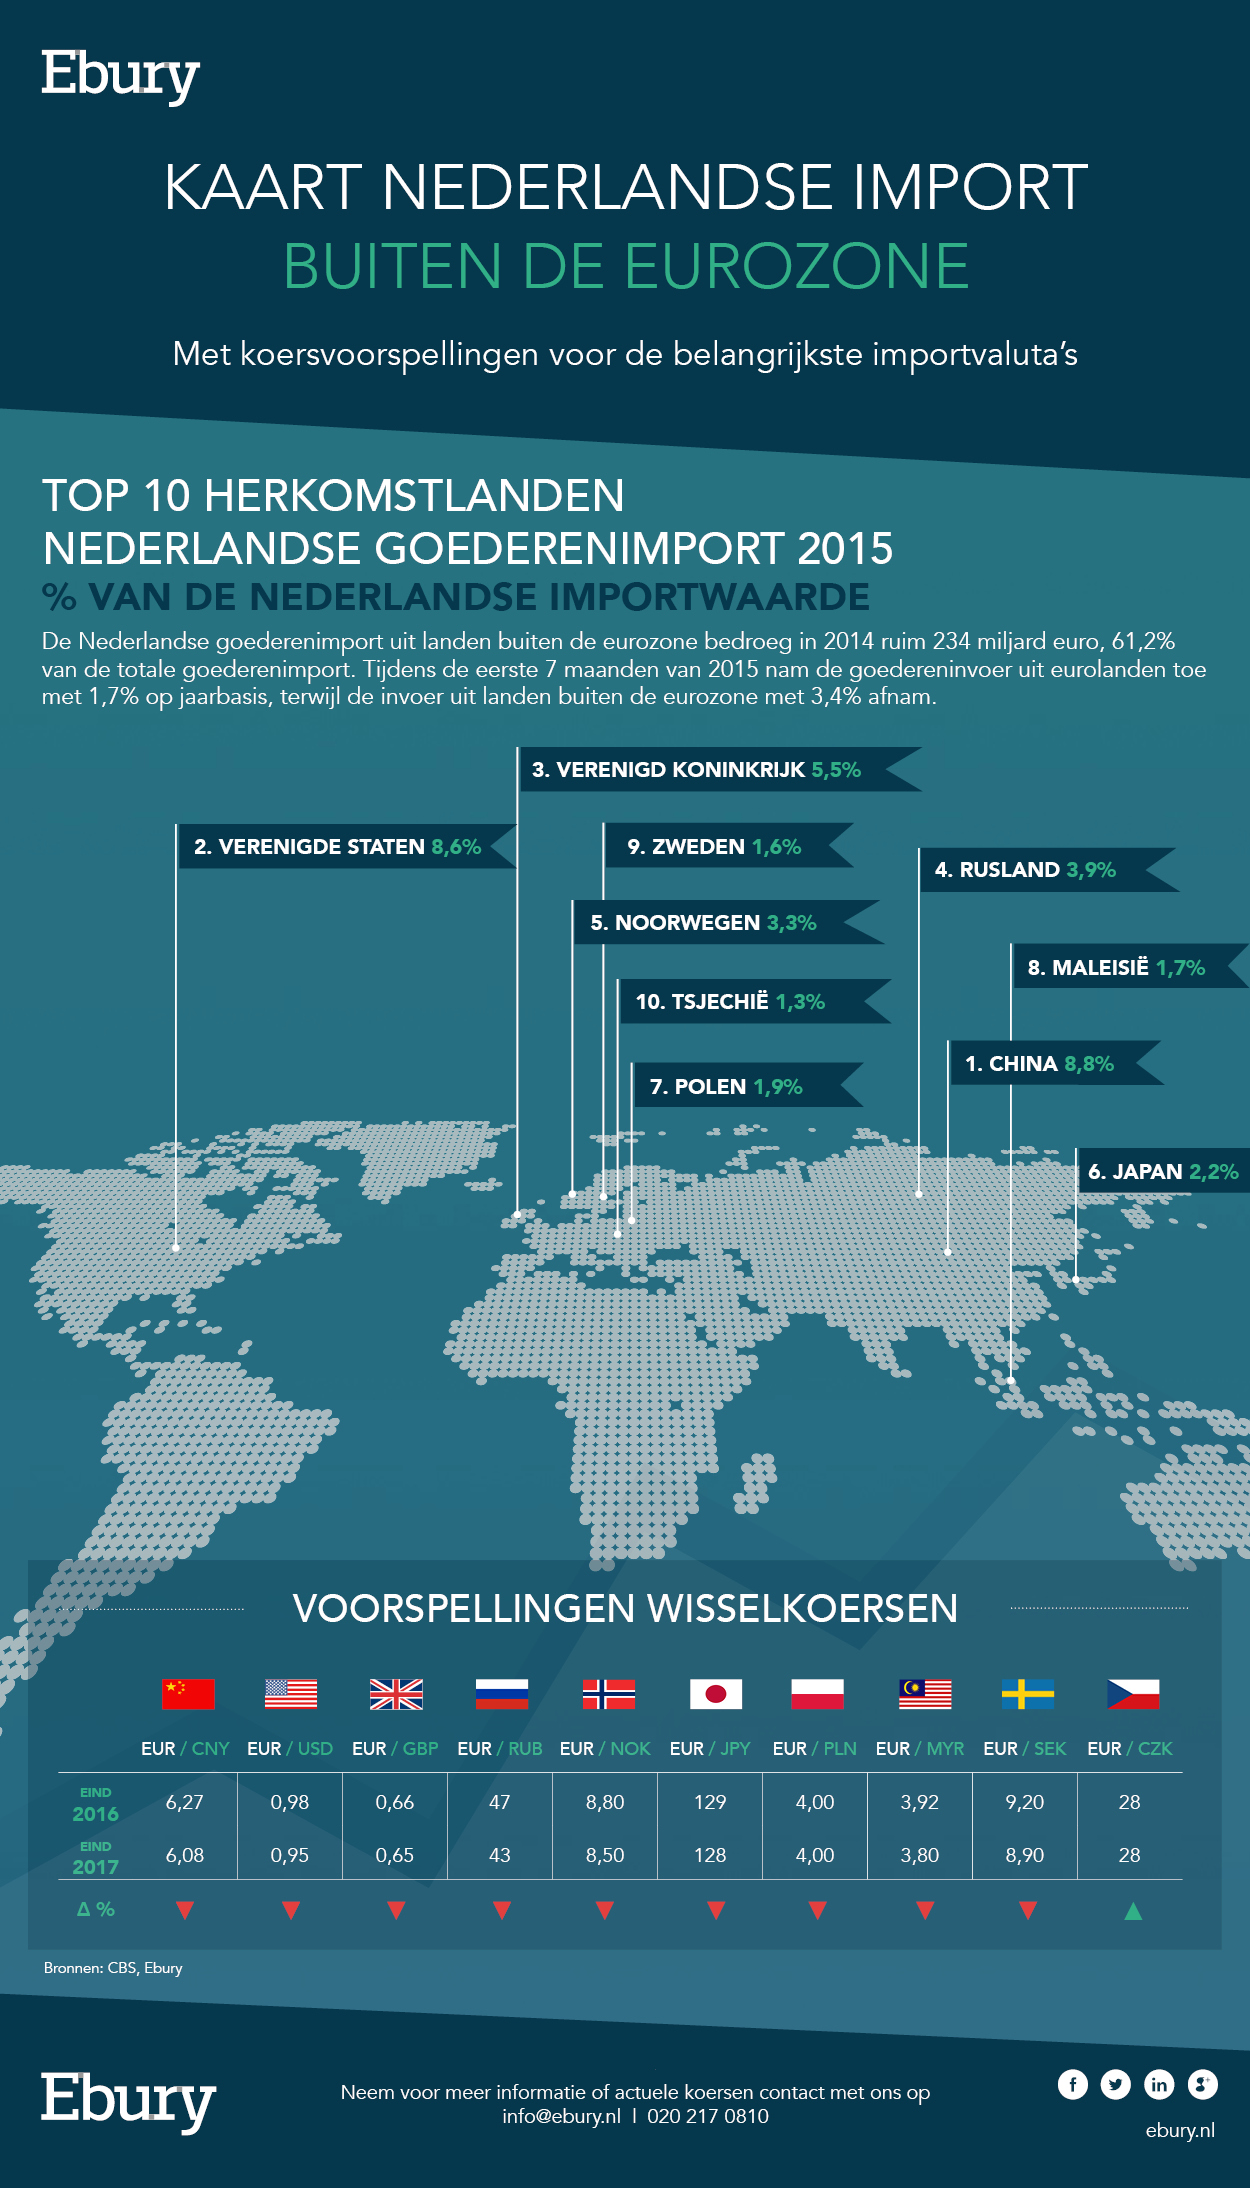 Kaart Nederlandse import